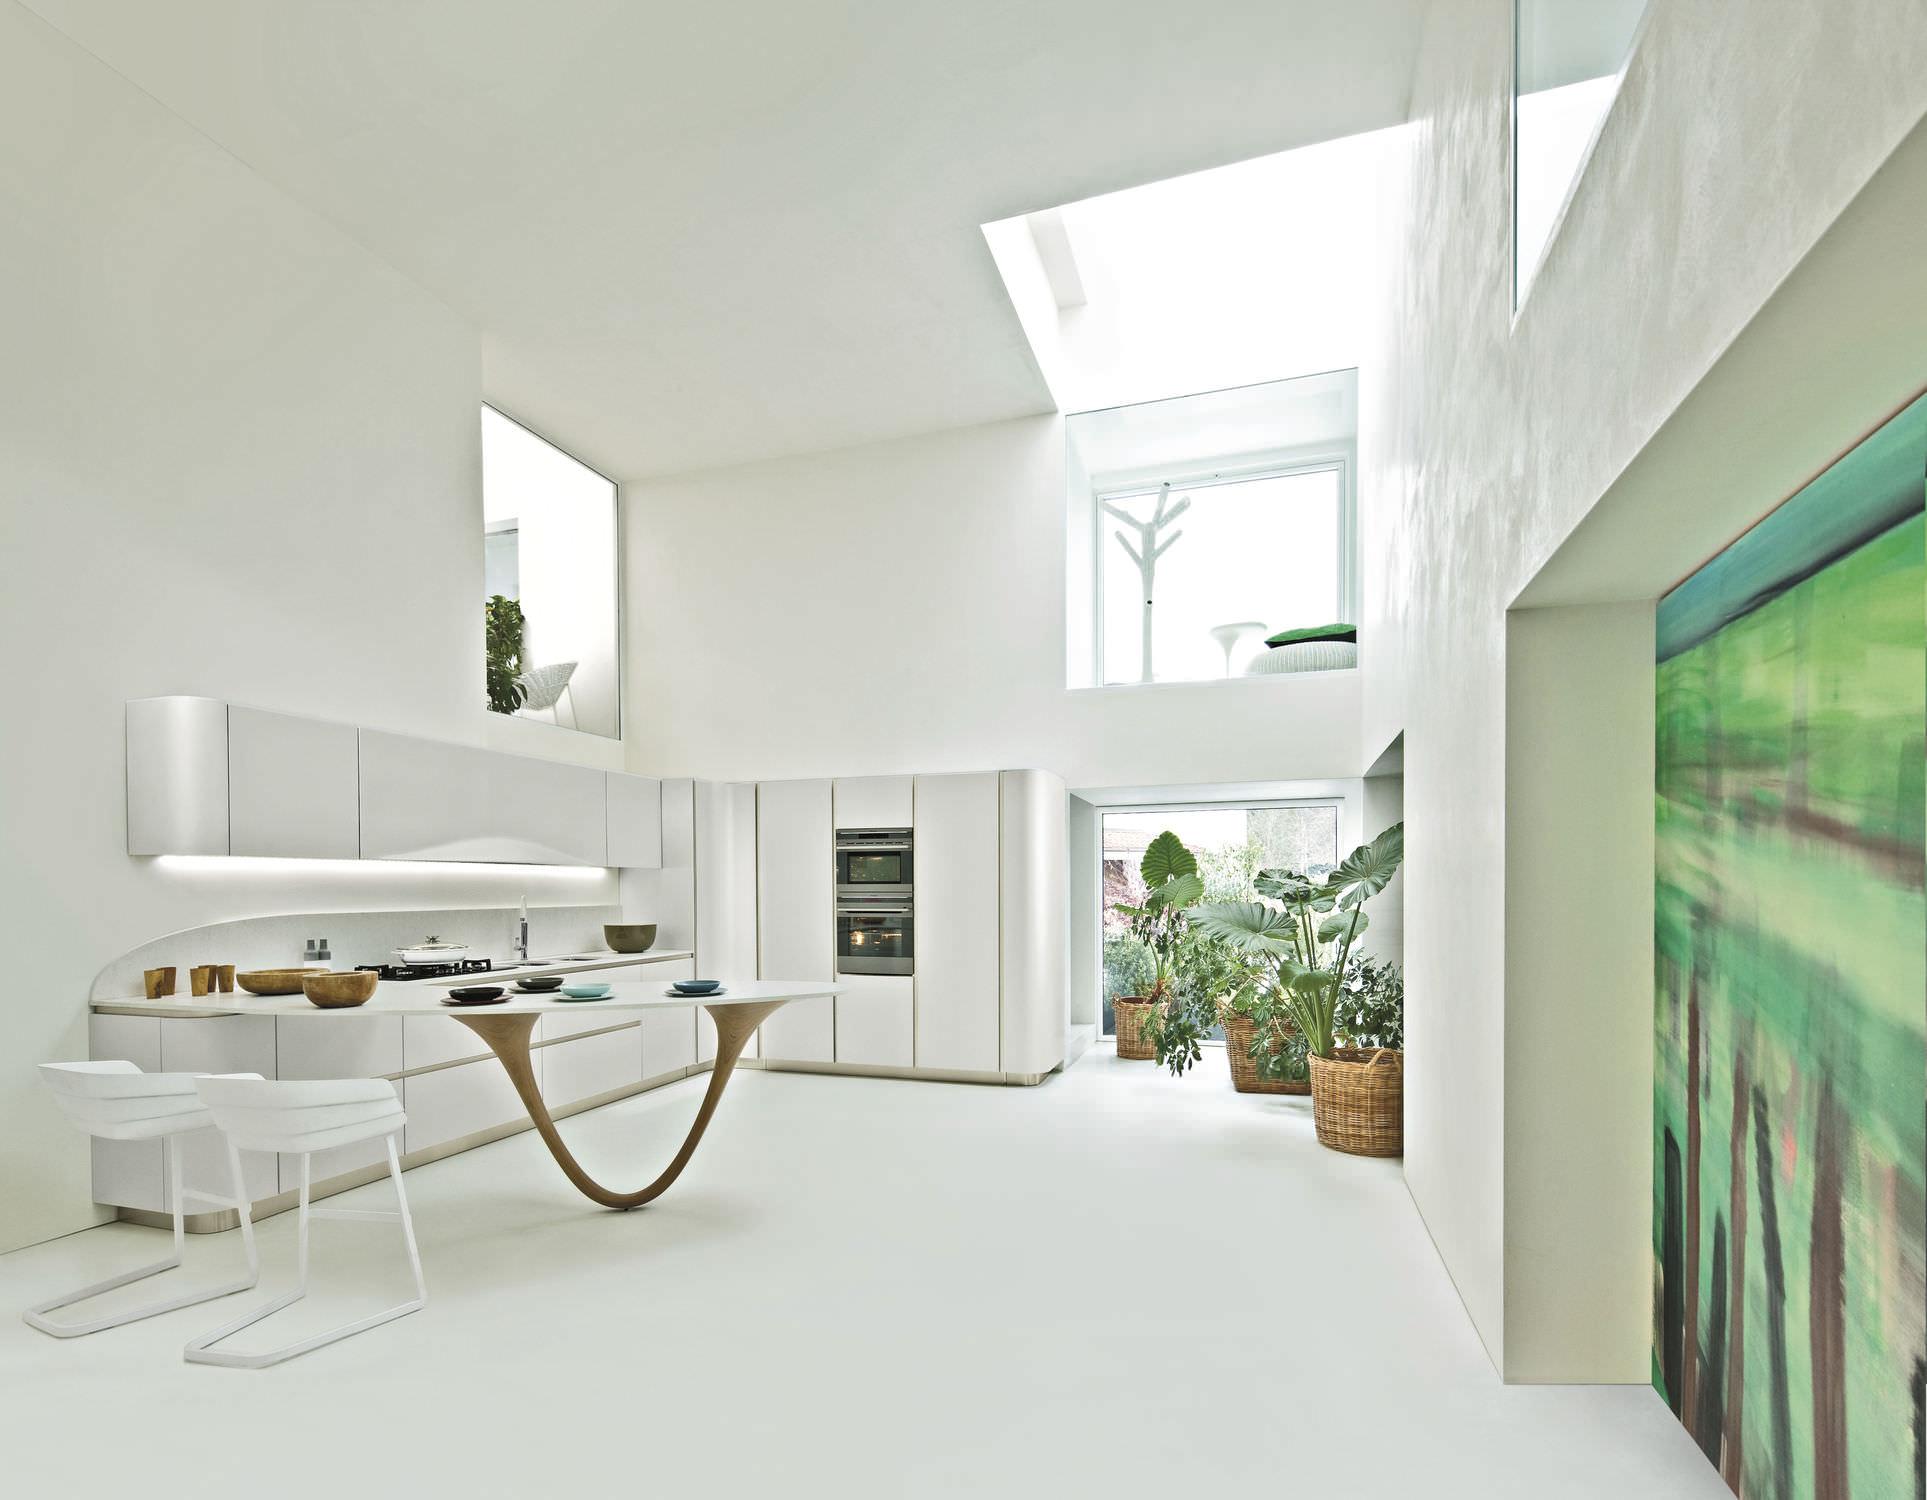 Moderne Küche / Holz / Kochinsel / lackiert - OLA 20 by Pininfarina ...